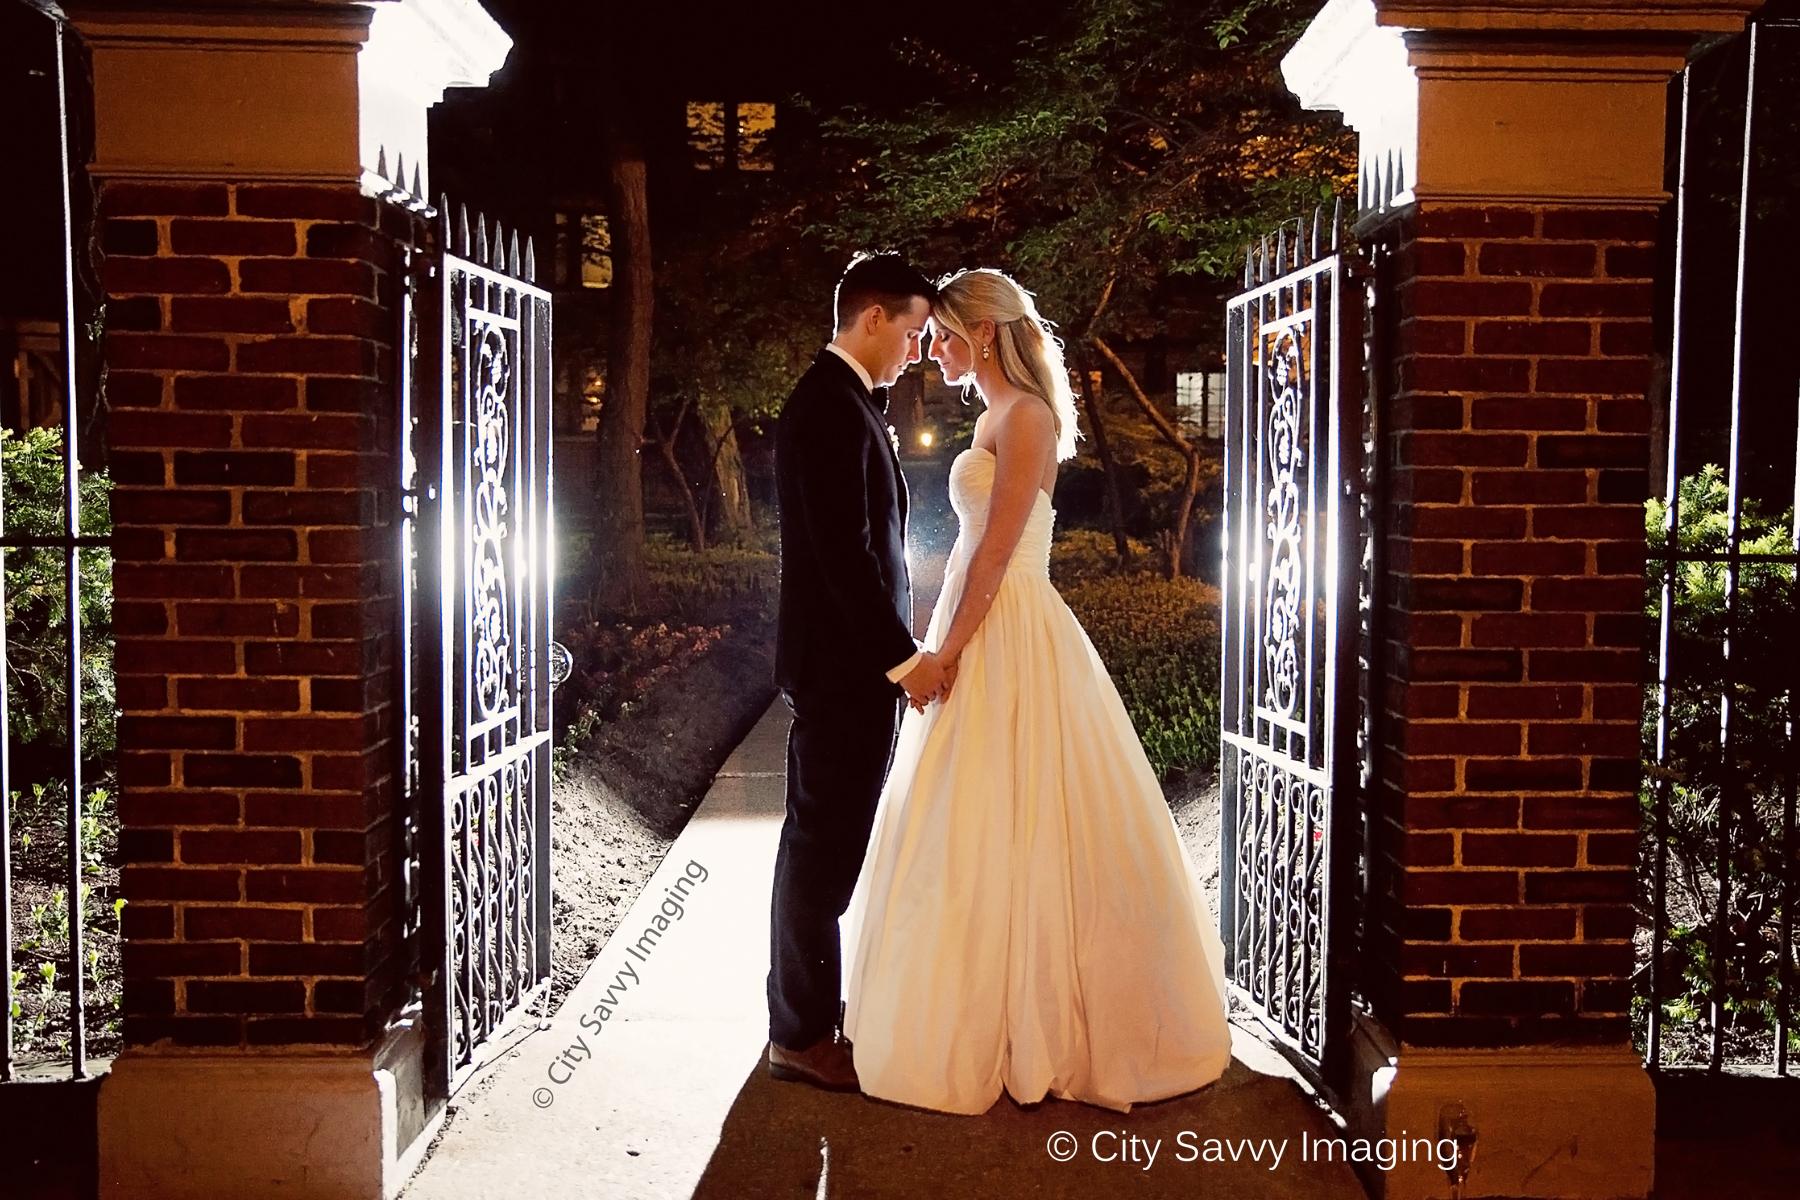 Lincoln Park Salvatores Saint Clement Ivy Hotel Wedding Chicago Illinois Destination Photographer 15